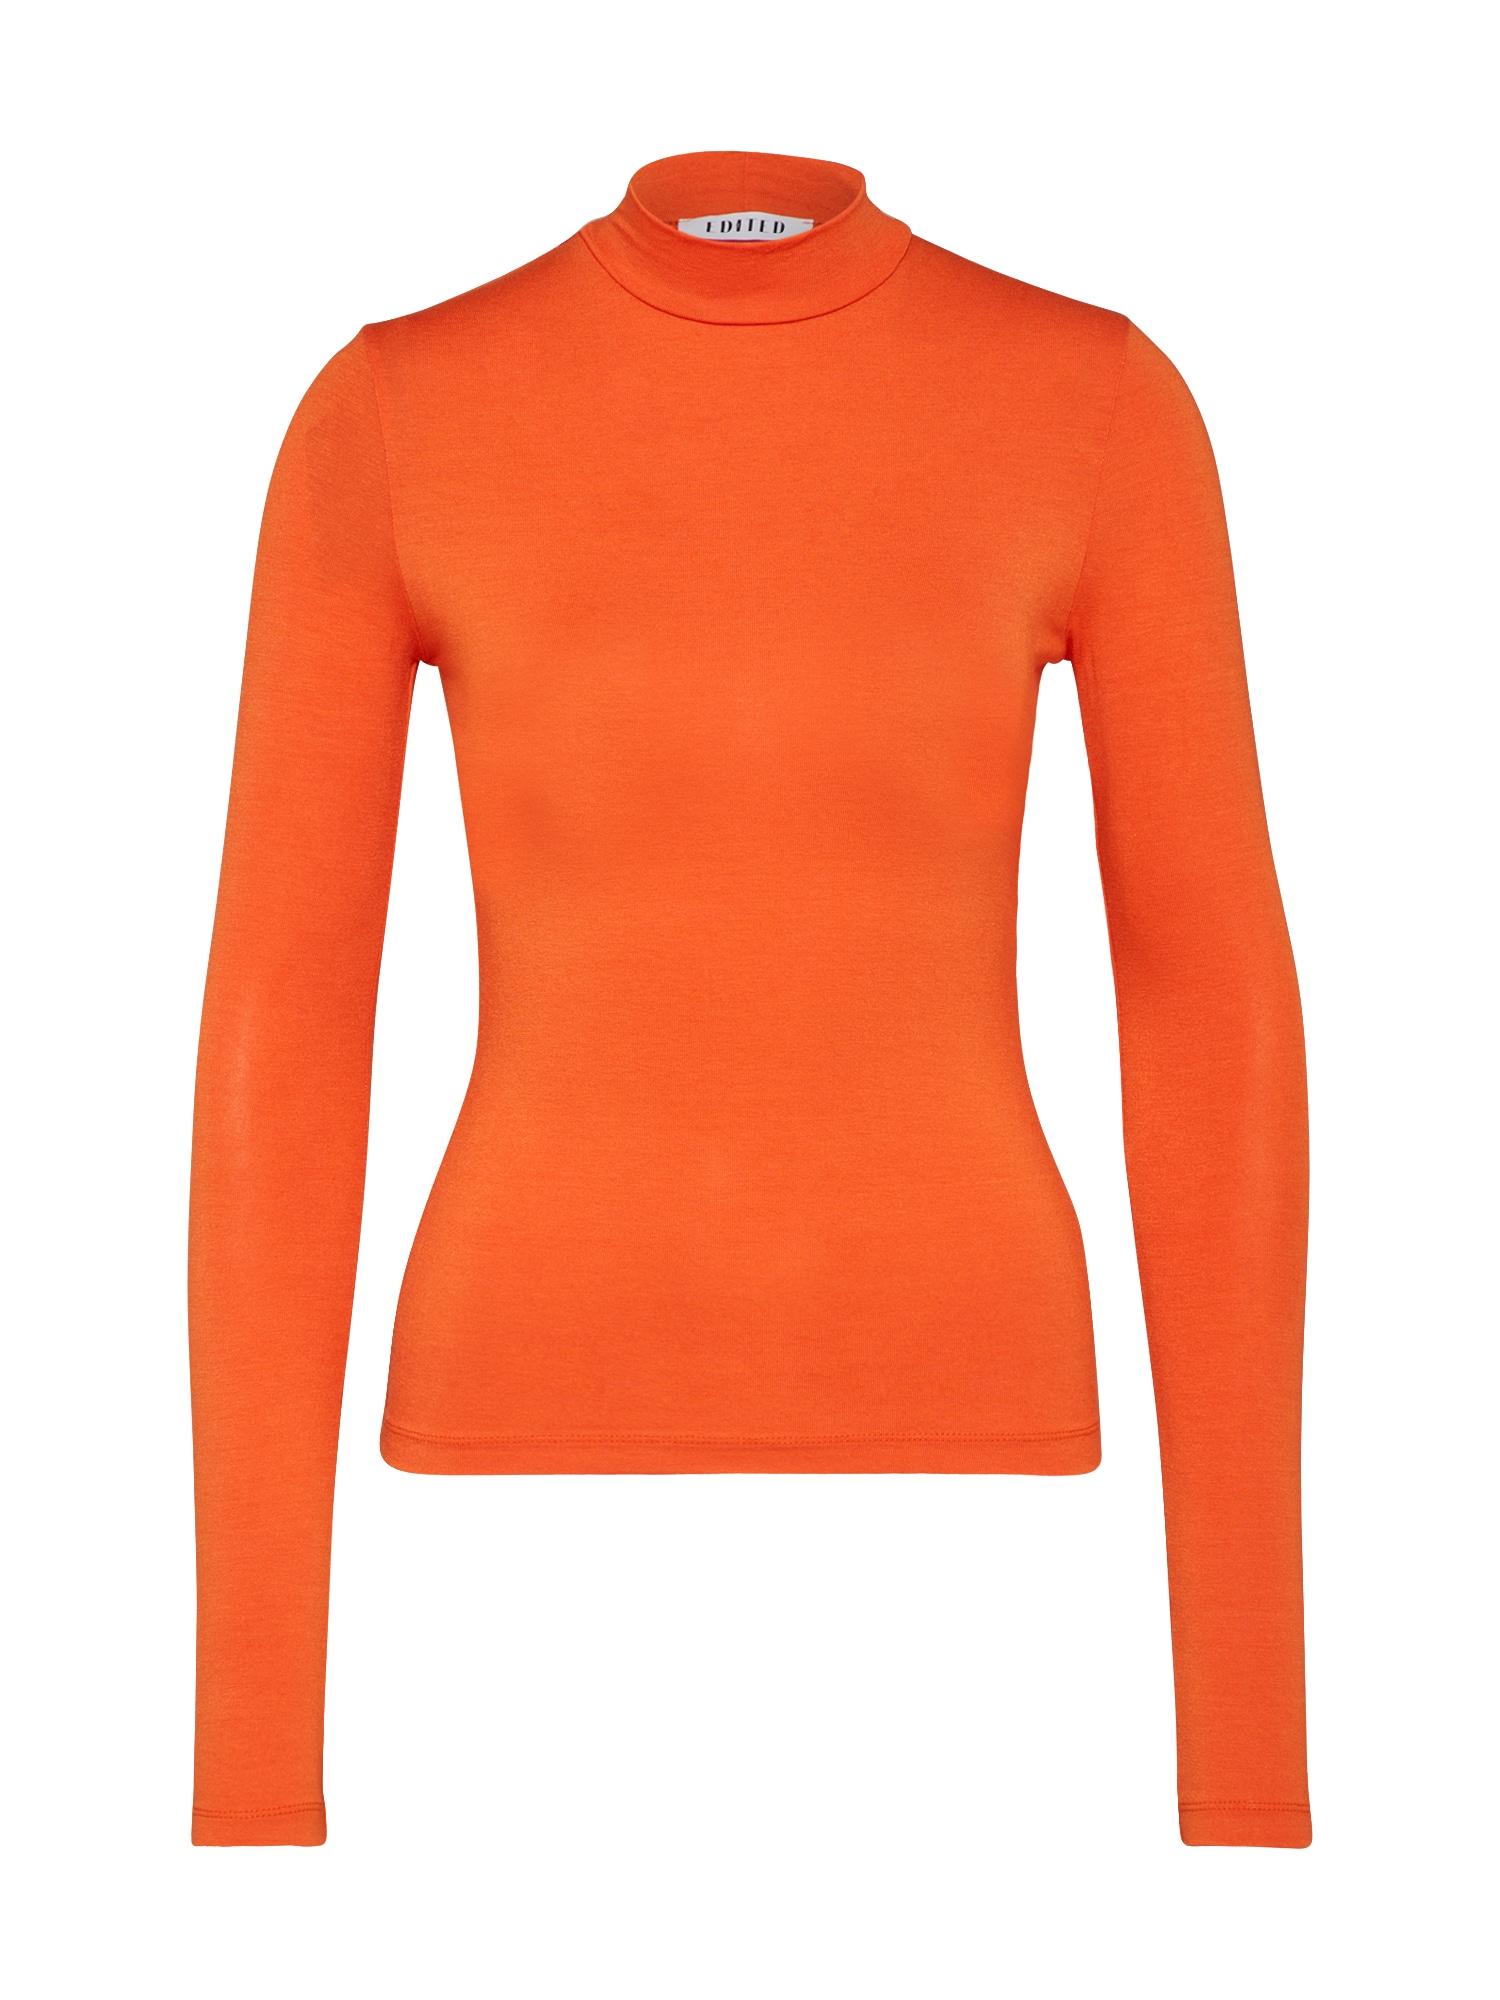 Tričko Marille tmavě oranžová EDITED